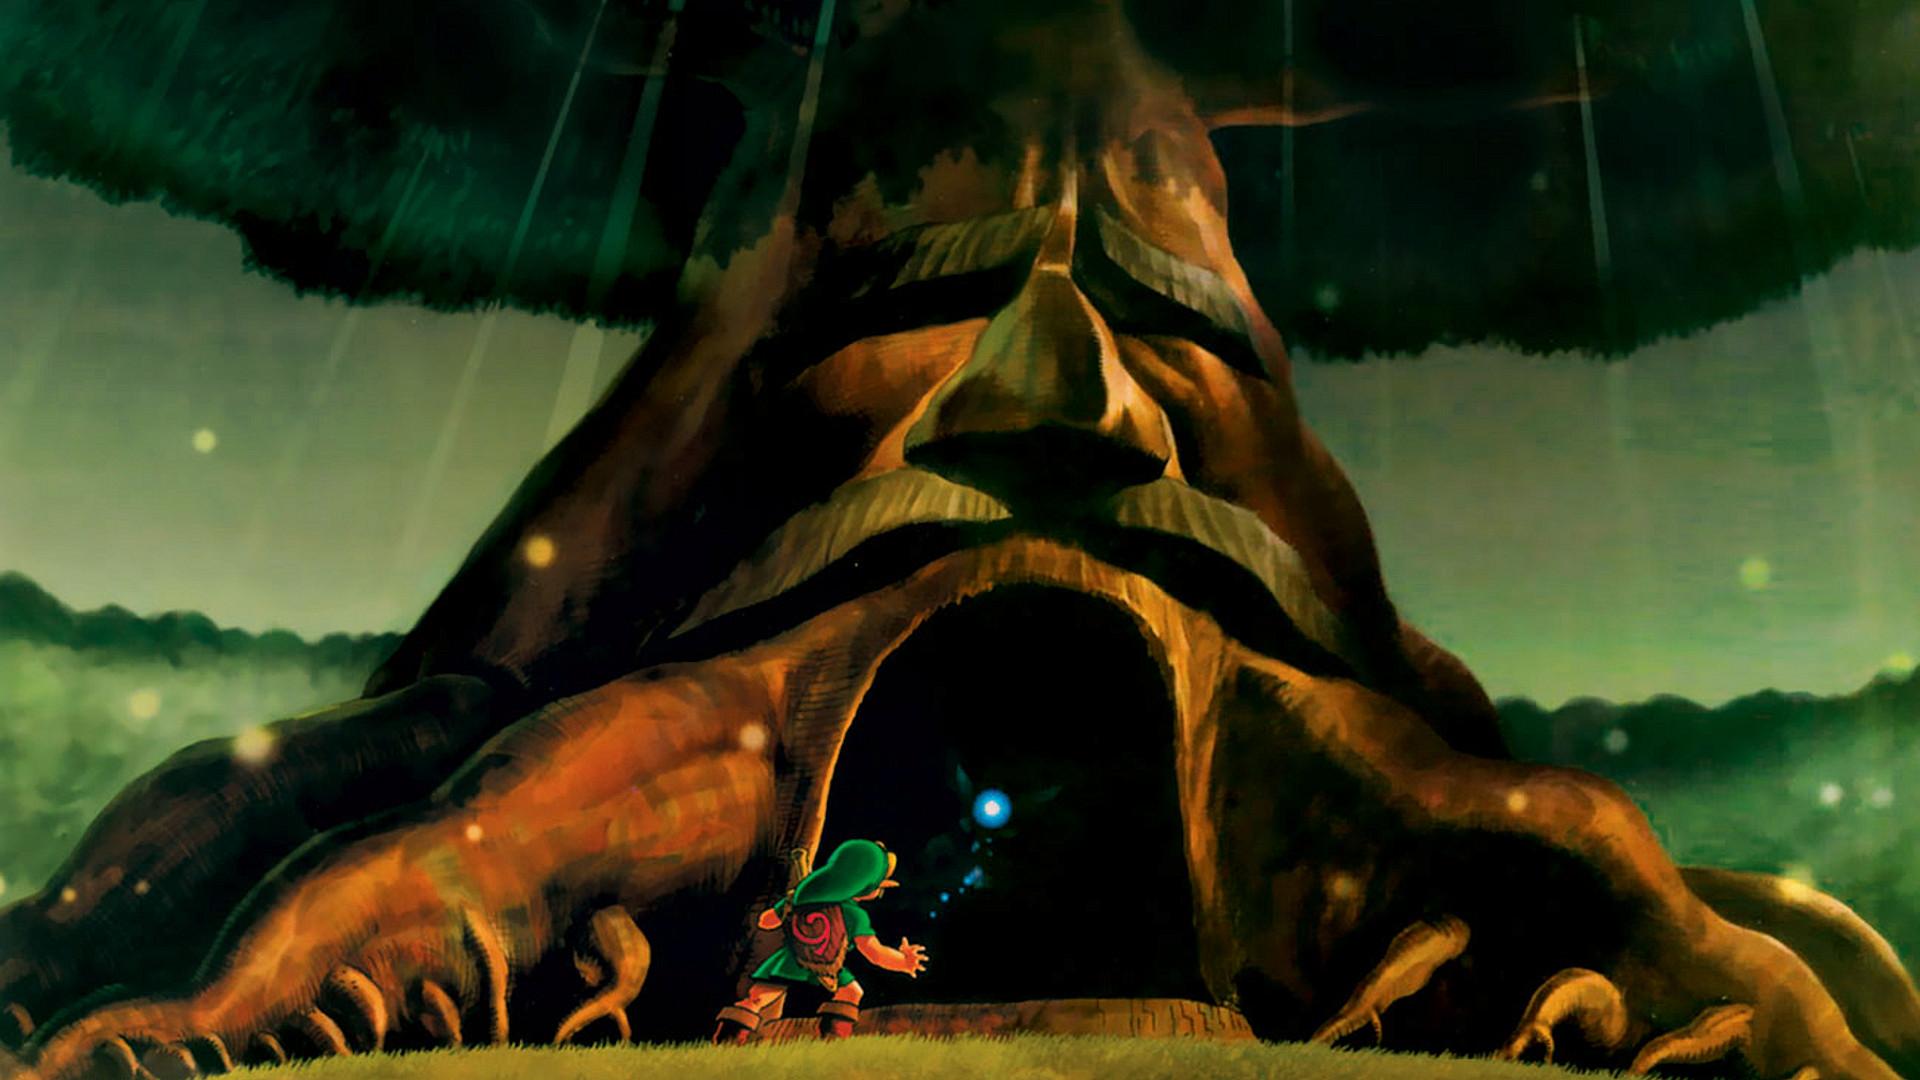 … The Legend of Zelda: Ocarina of Time – Fanart – Background …